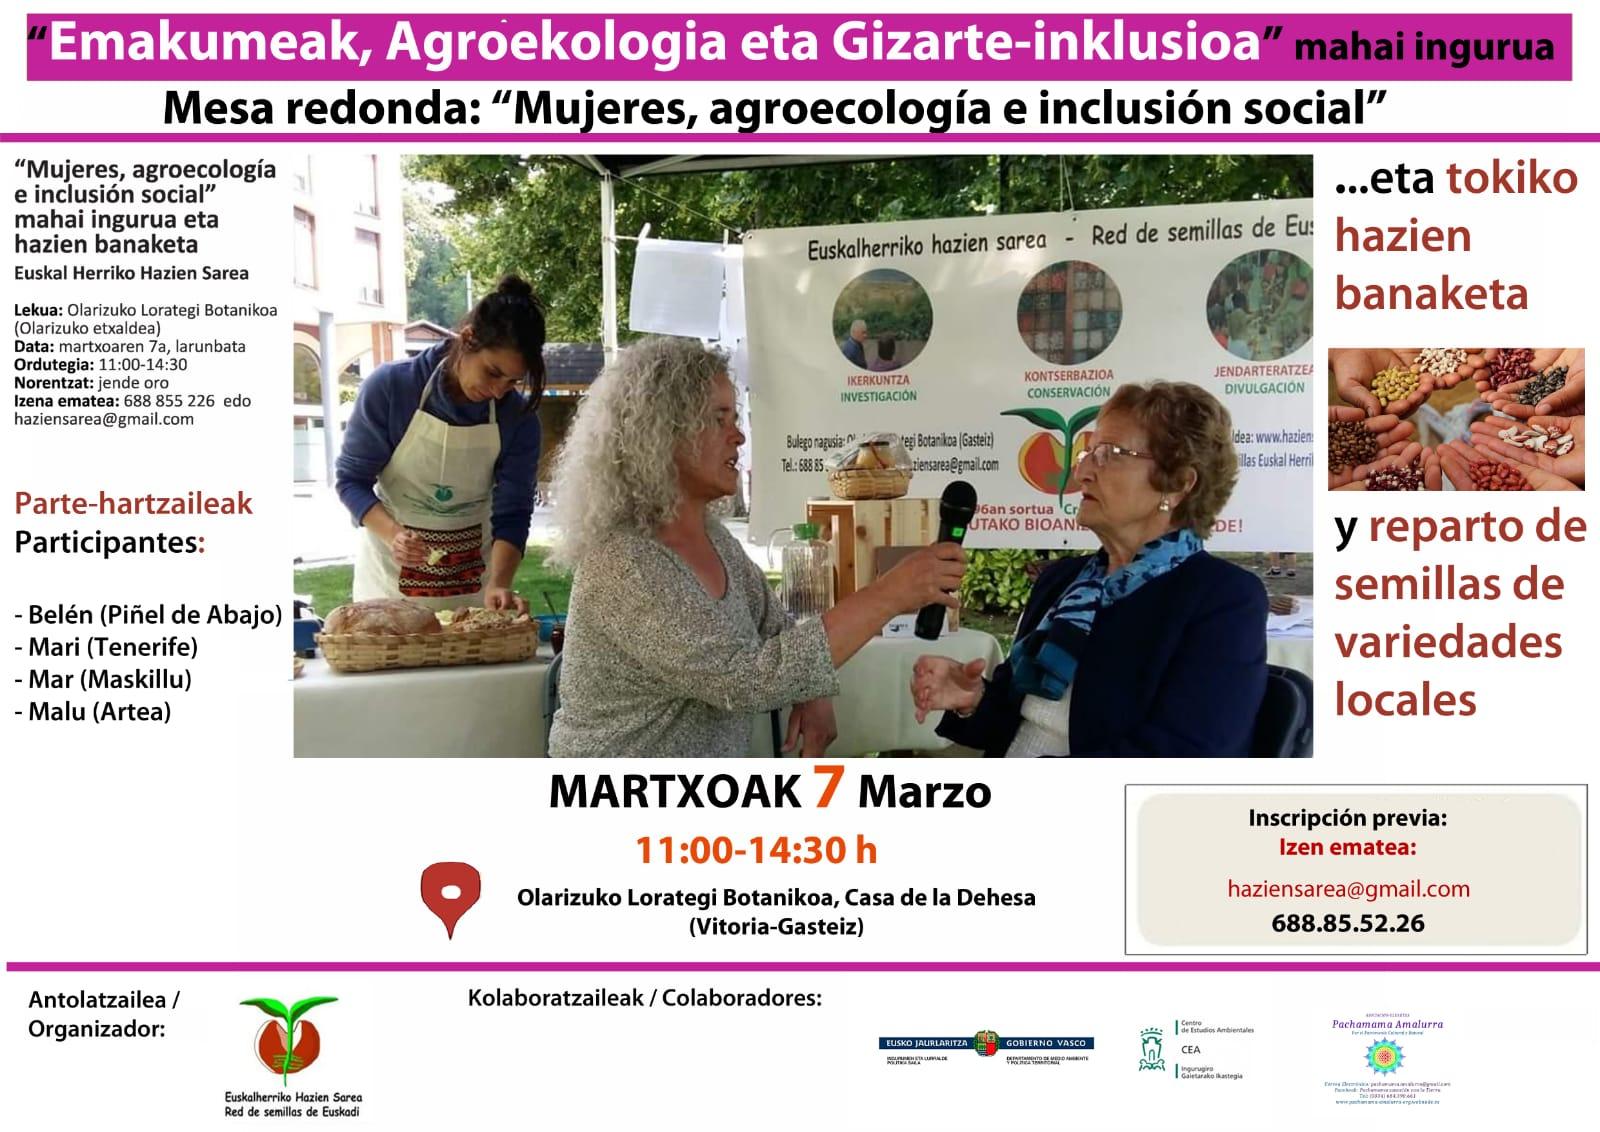 Mujeres, Agroecología e inclusión social